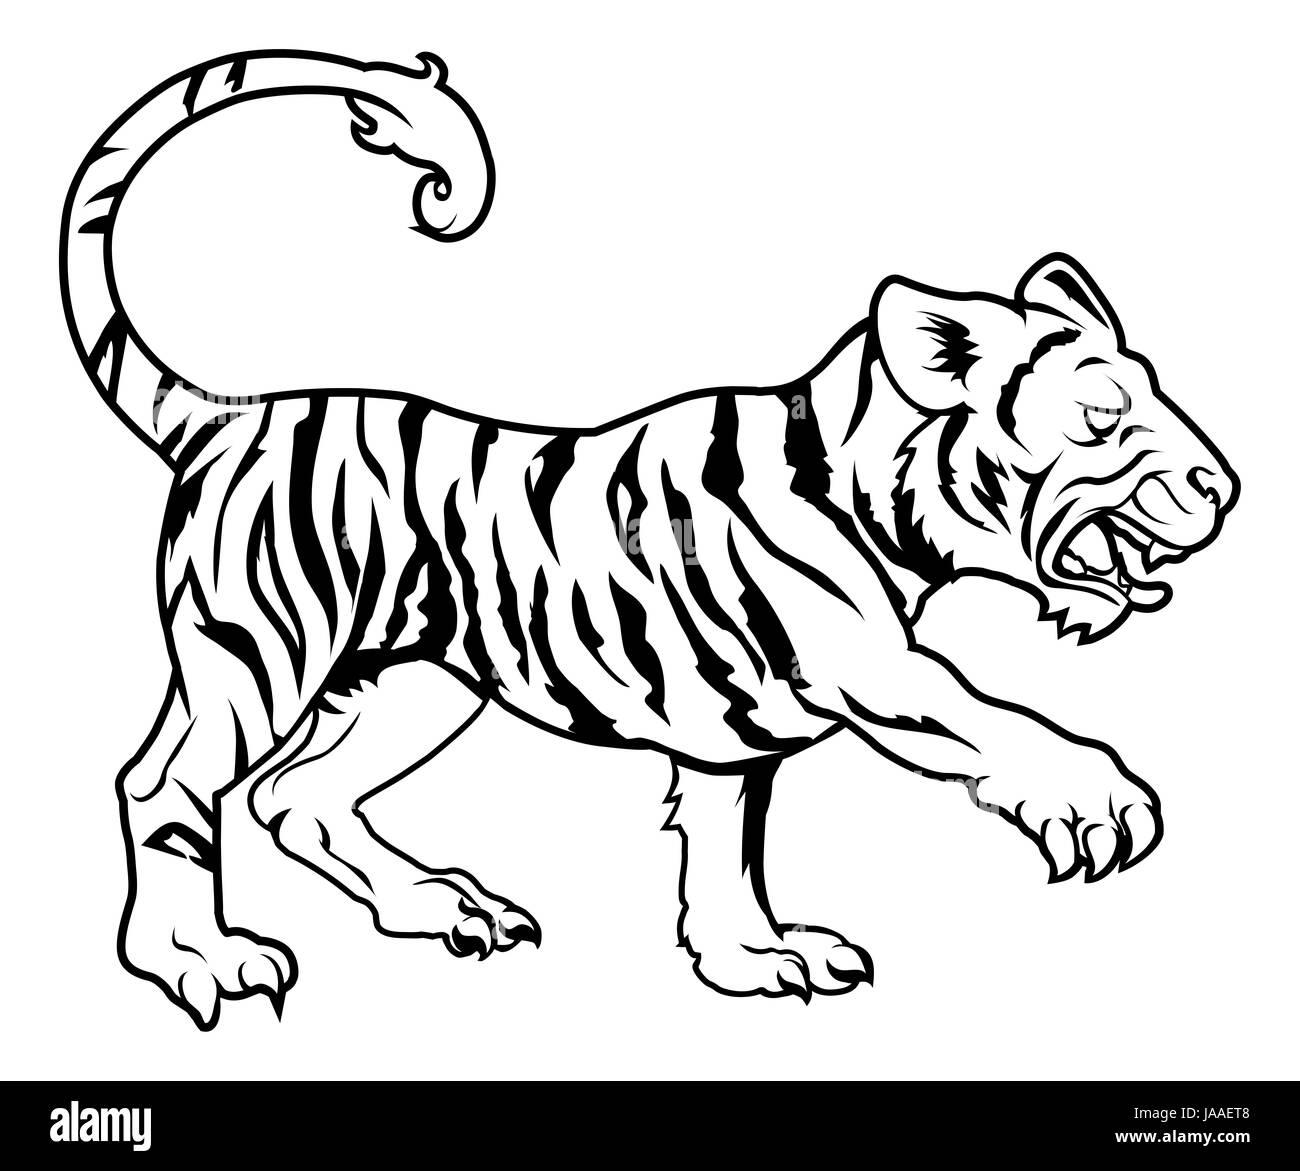 legs, birth, childbirth, parturition, delivery, emblem, animal, new, black, - Stock Image